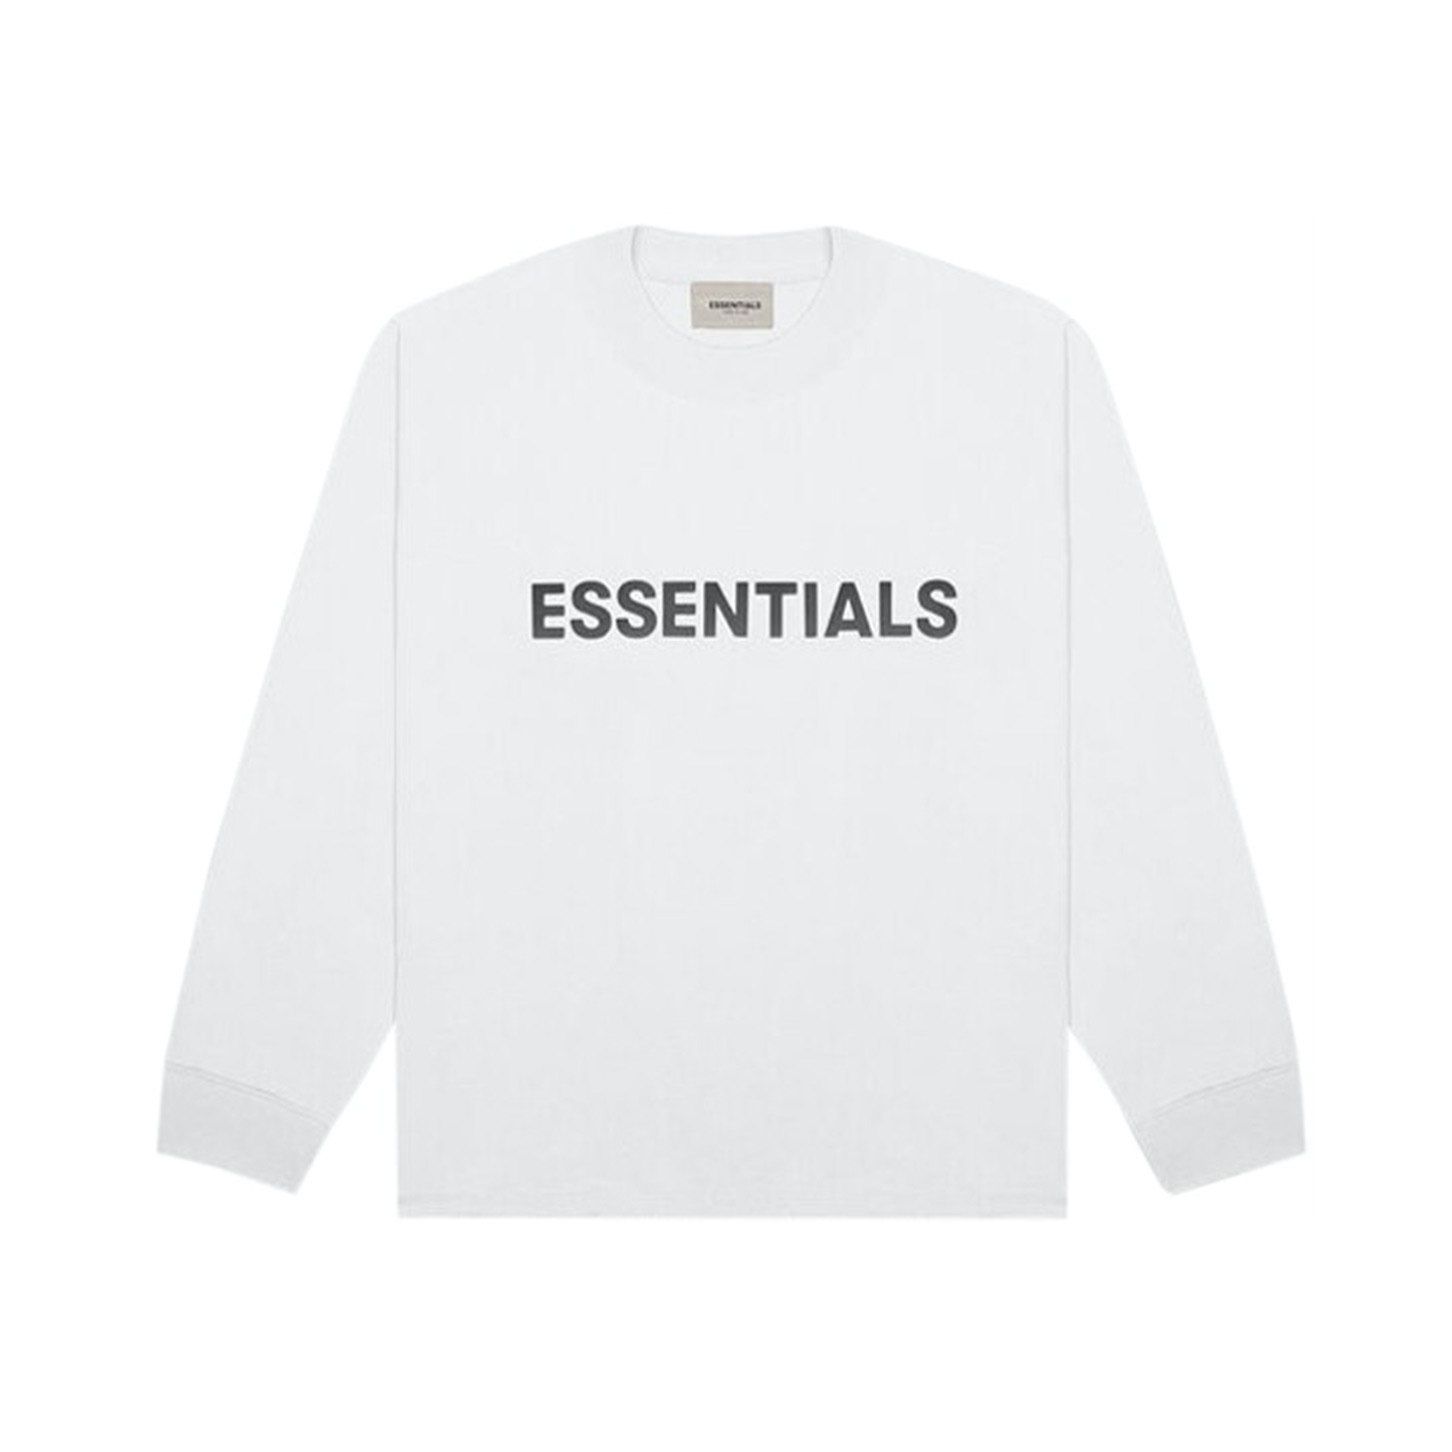 FEAR OF GOD ESSENTIALS Long Sleeve T-Shirt White 20SS